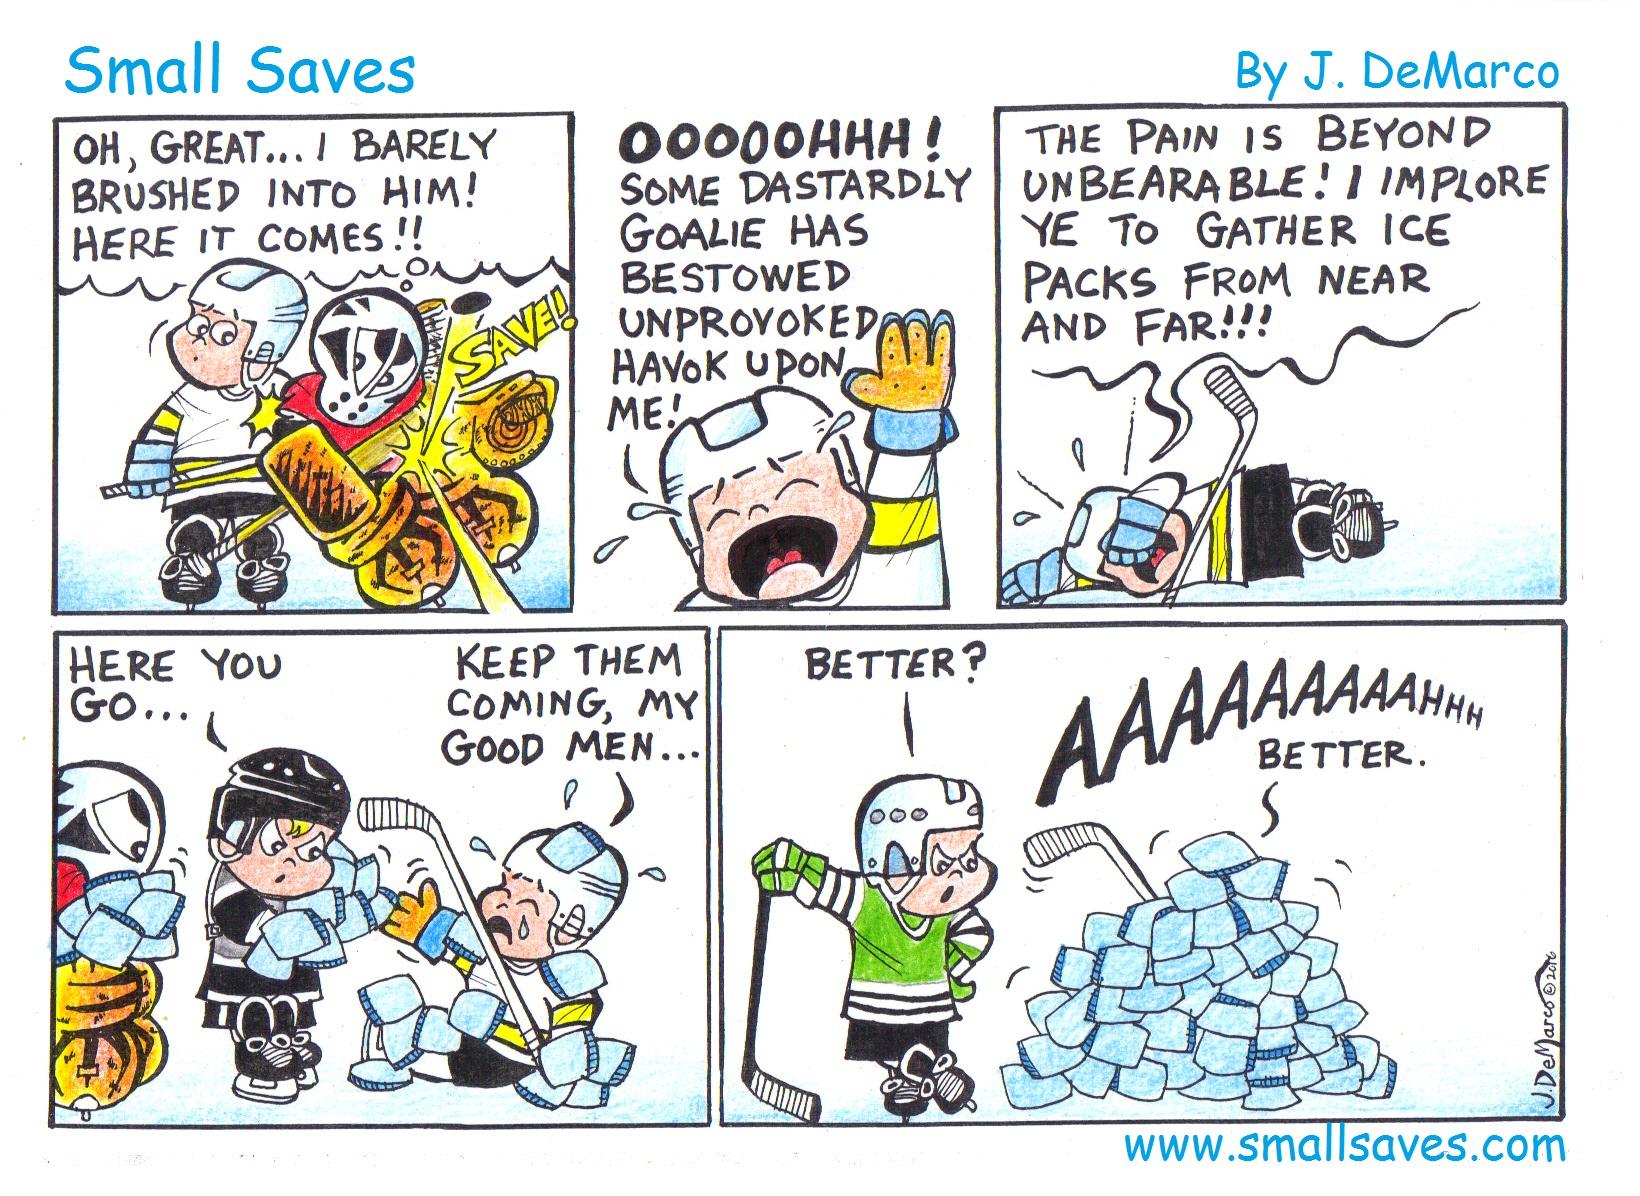 smallsaves_icebags